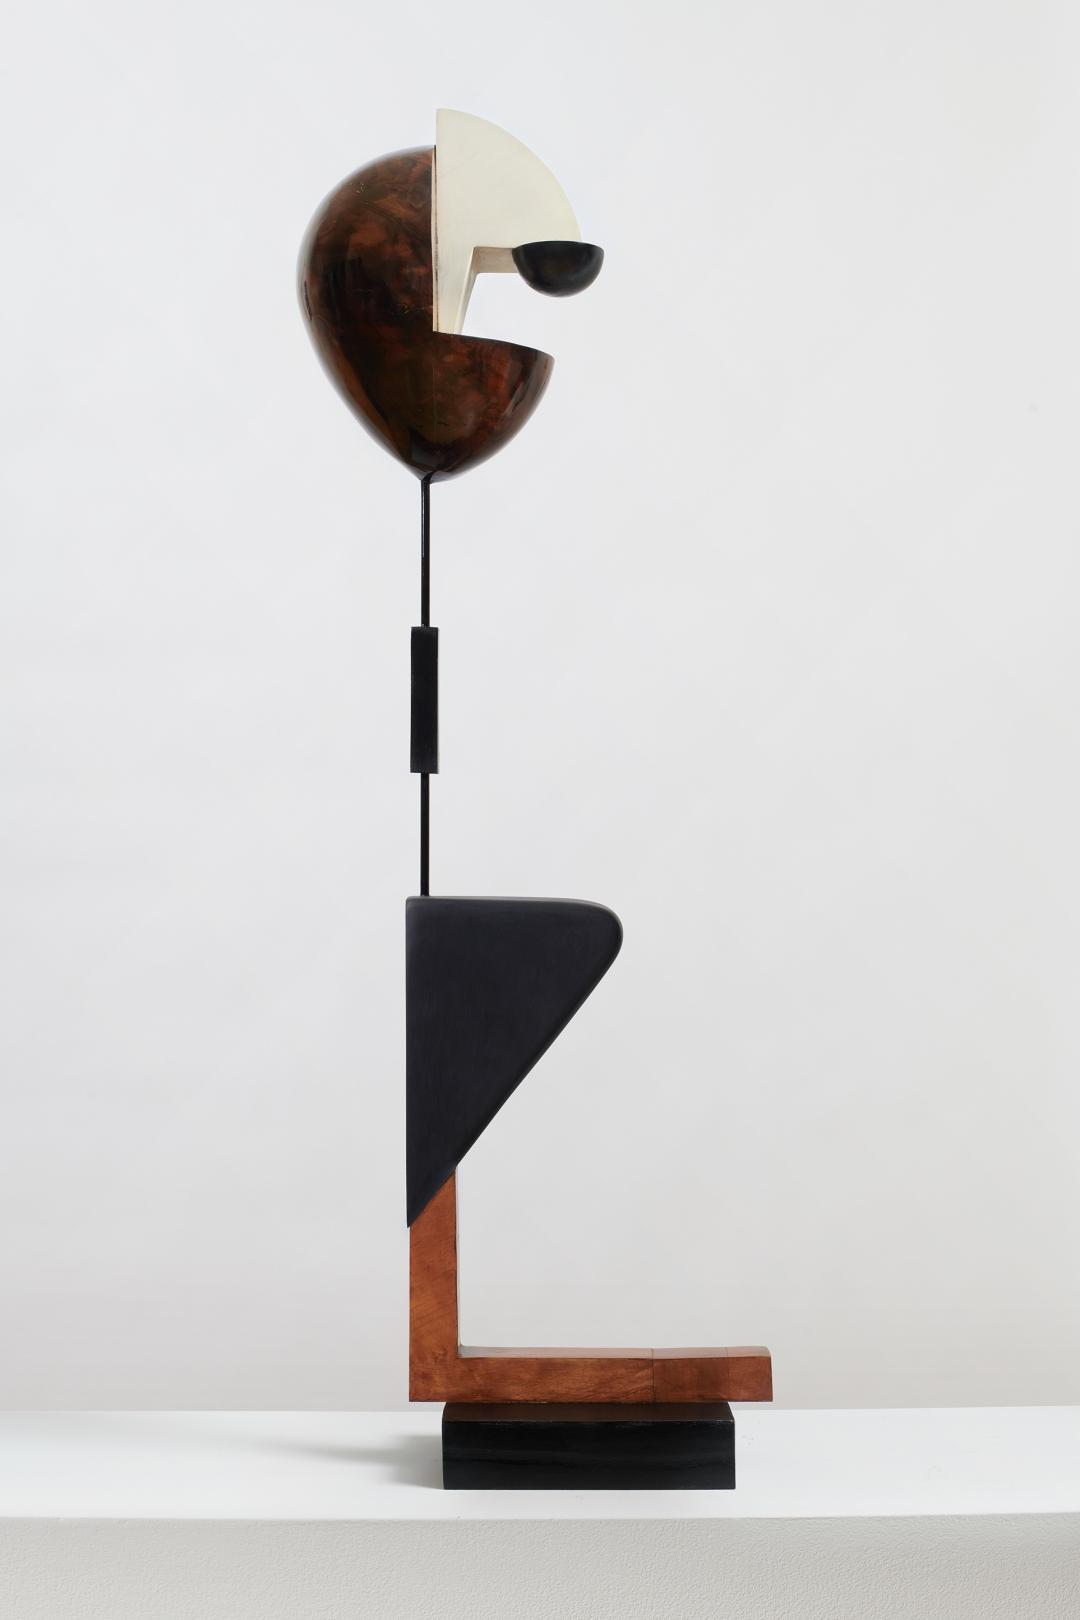 Christina Kruse, <i>Matrose</i>, 2019, Wood, oil, acrylic paint, metal, ink, wax, and varnish, 36 x 5.5 x 10.5 in.